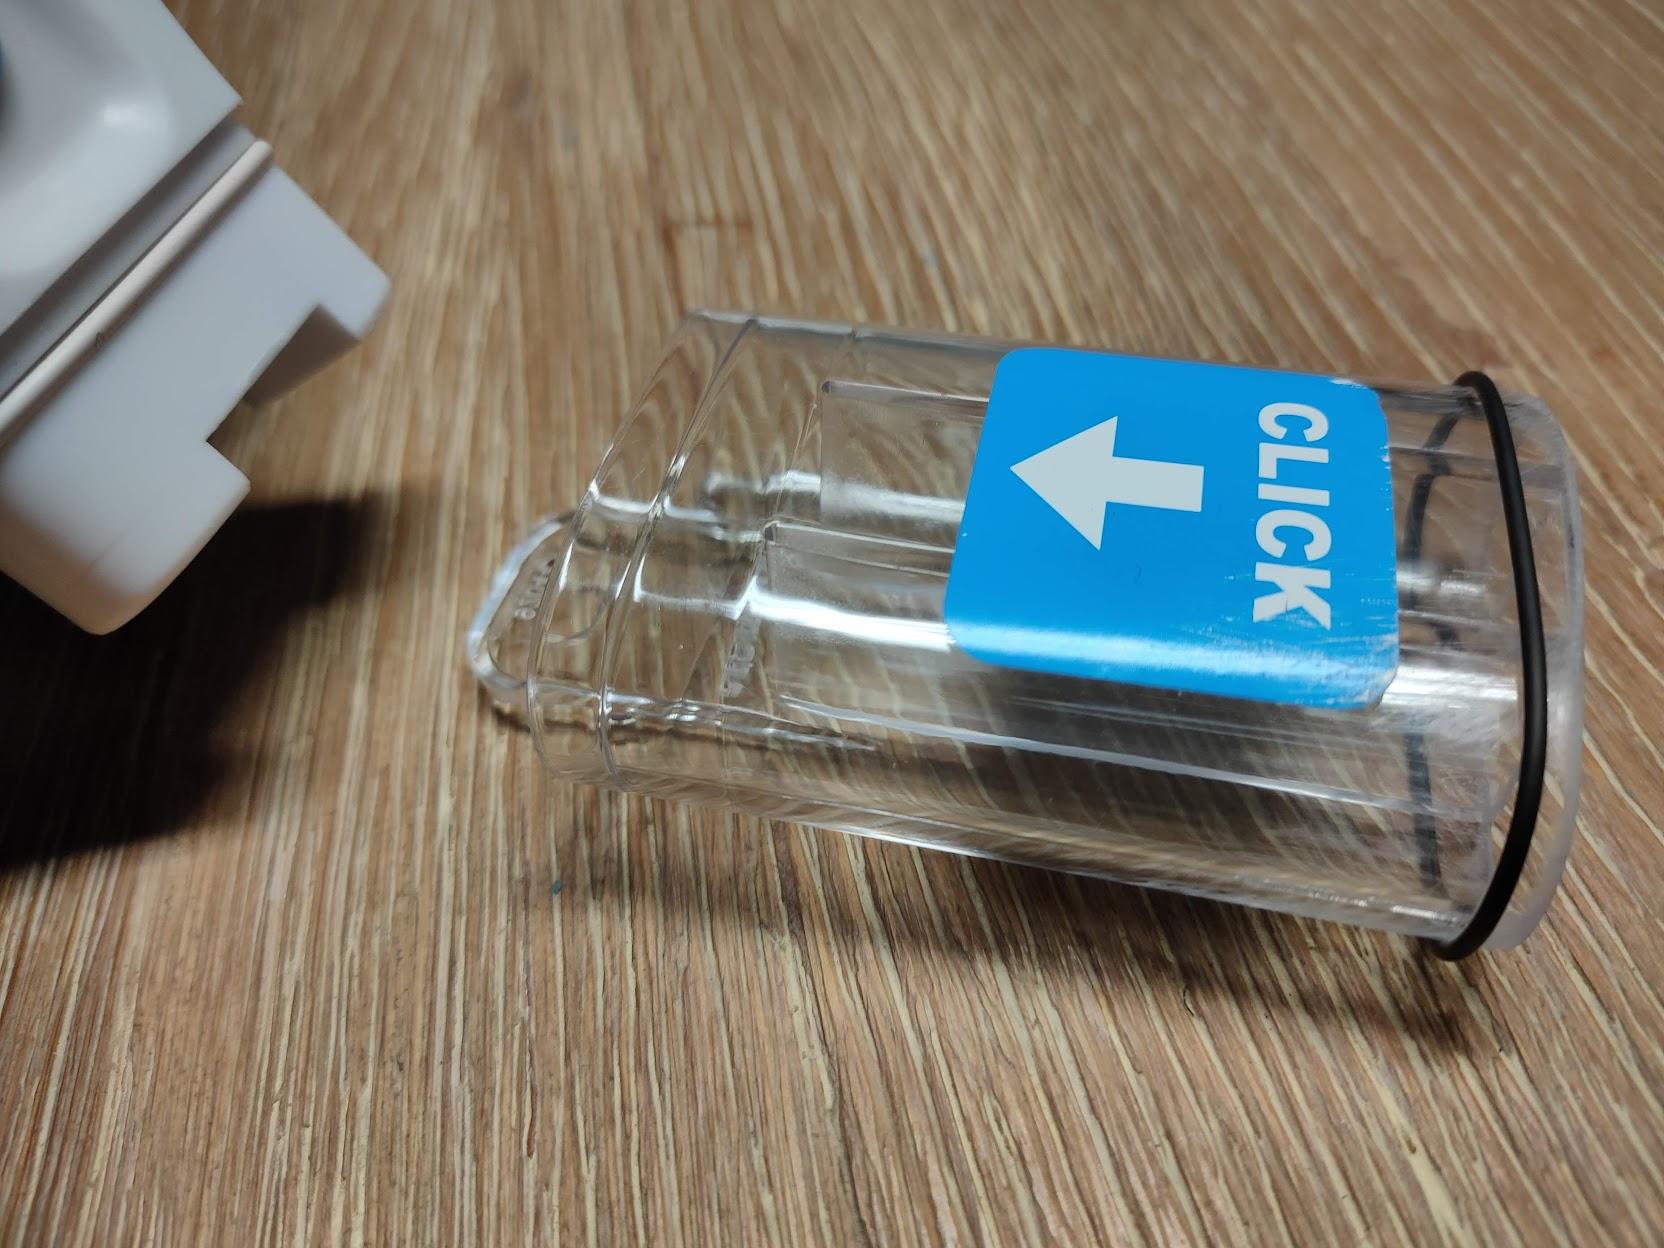 Detalle tubo mascara a conectarse con la pieza 3D